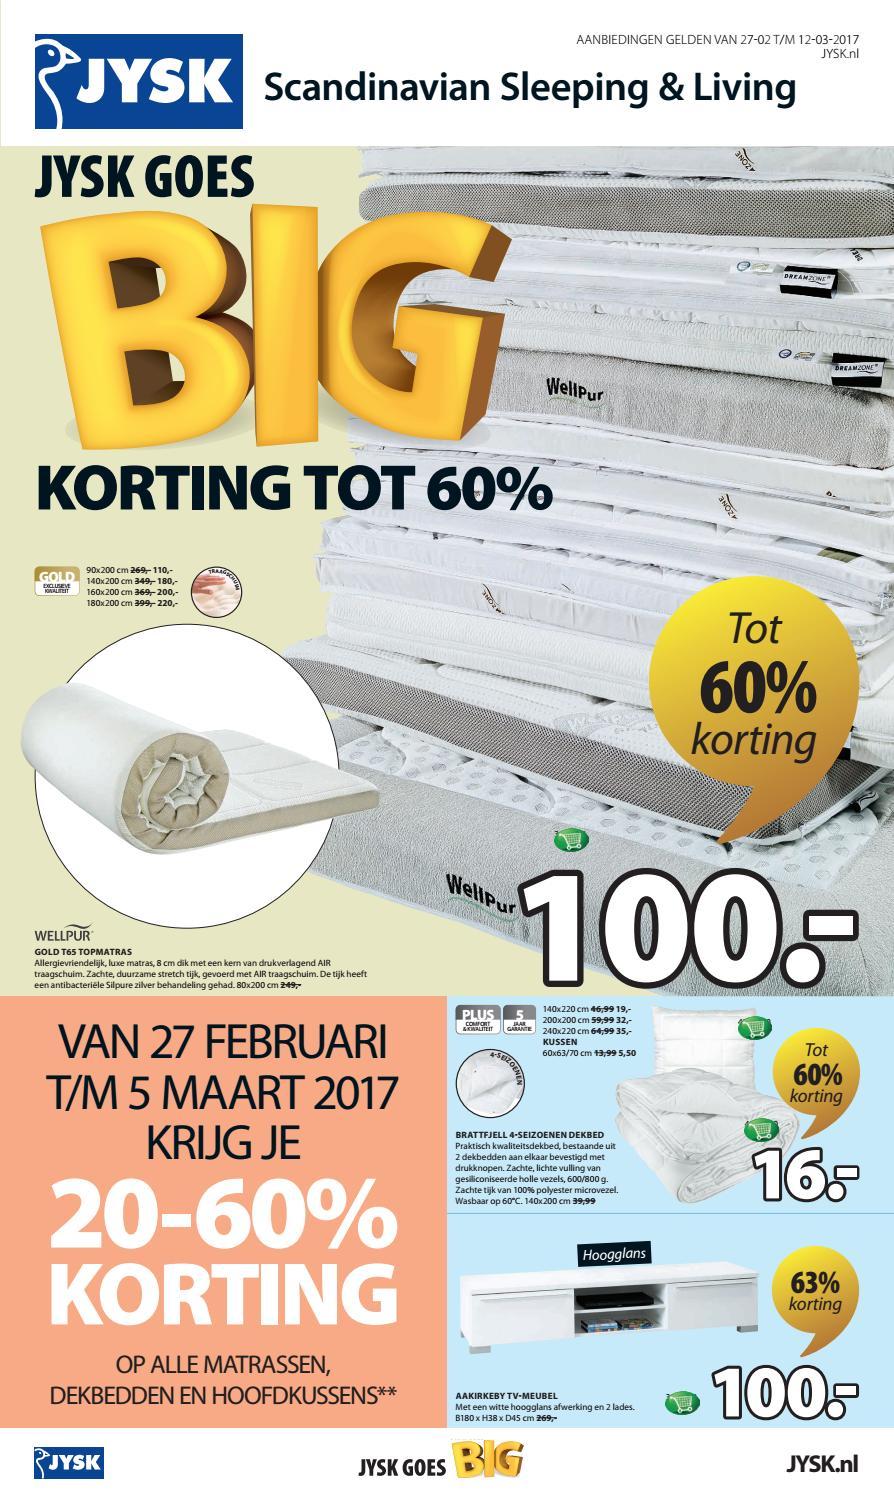 Slaapbank Chaise Longue Havdrup Grijs.Cp1009 20170301 Jysk Goes Big By Publisher 81 Nl Issuu